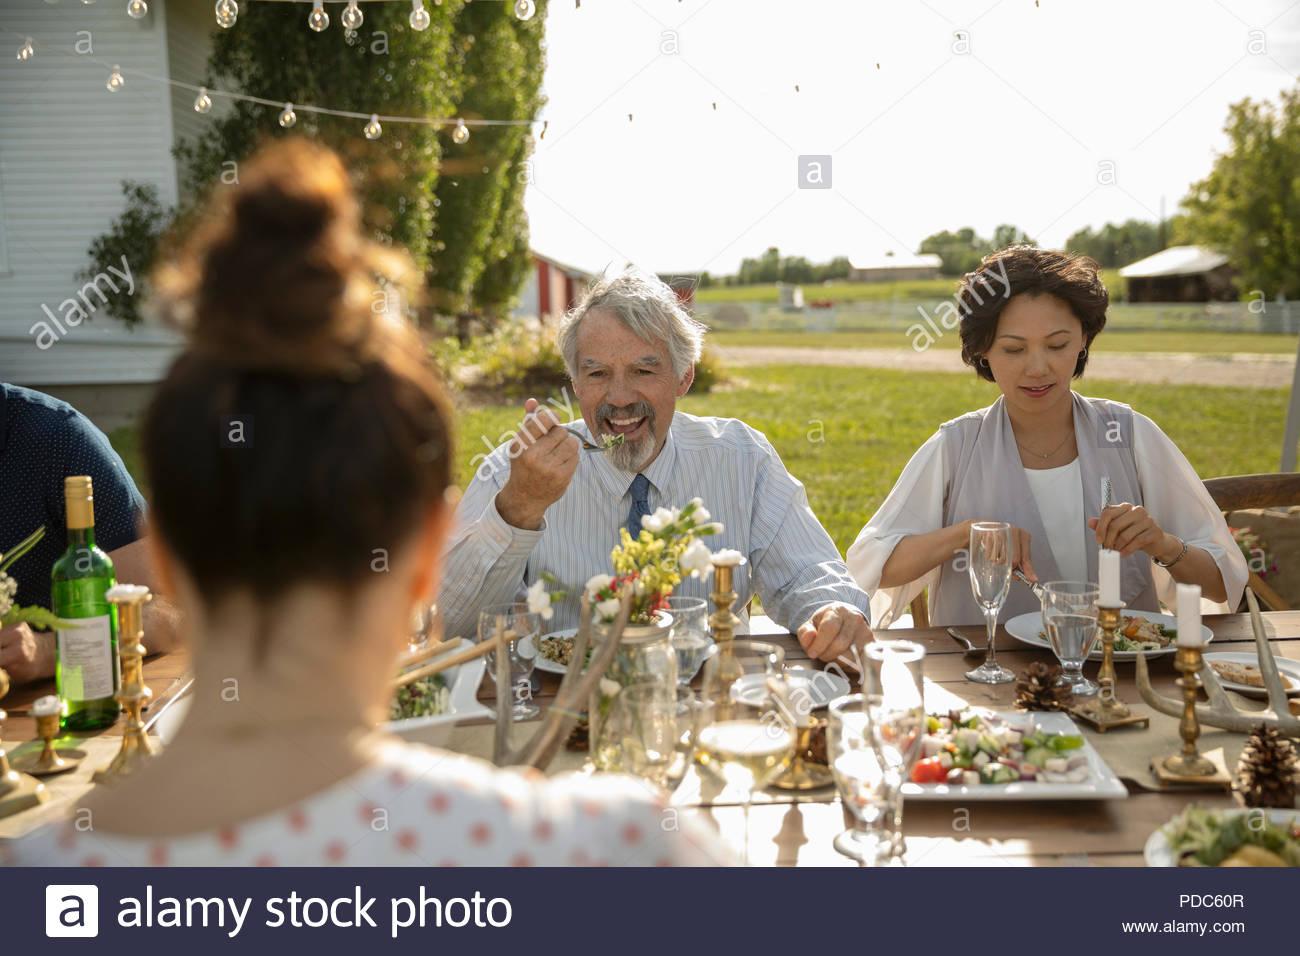 Bénéficiant d'amis déjeuner garden party Photo Stock